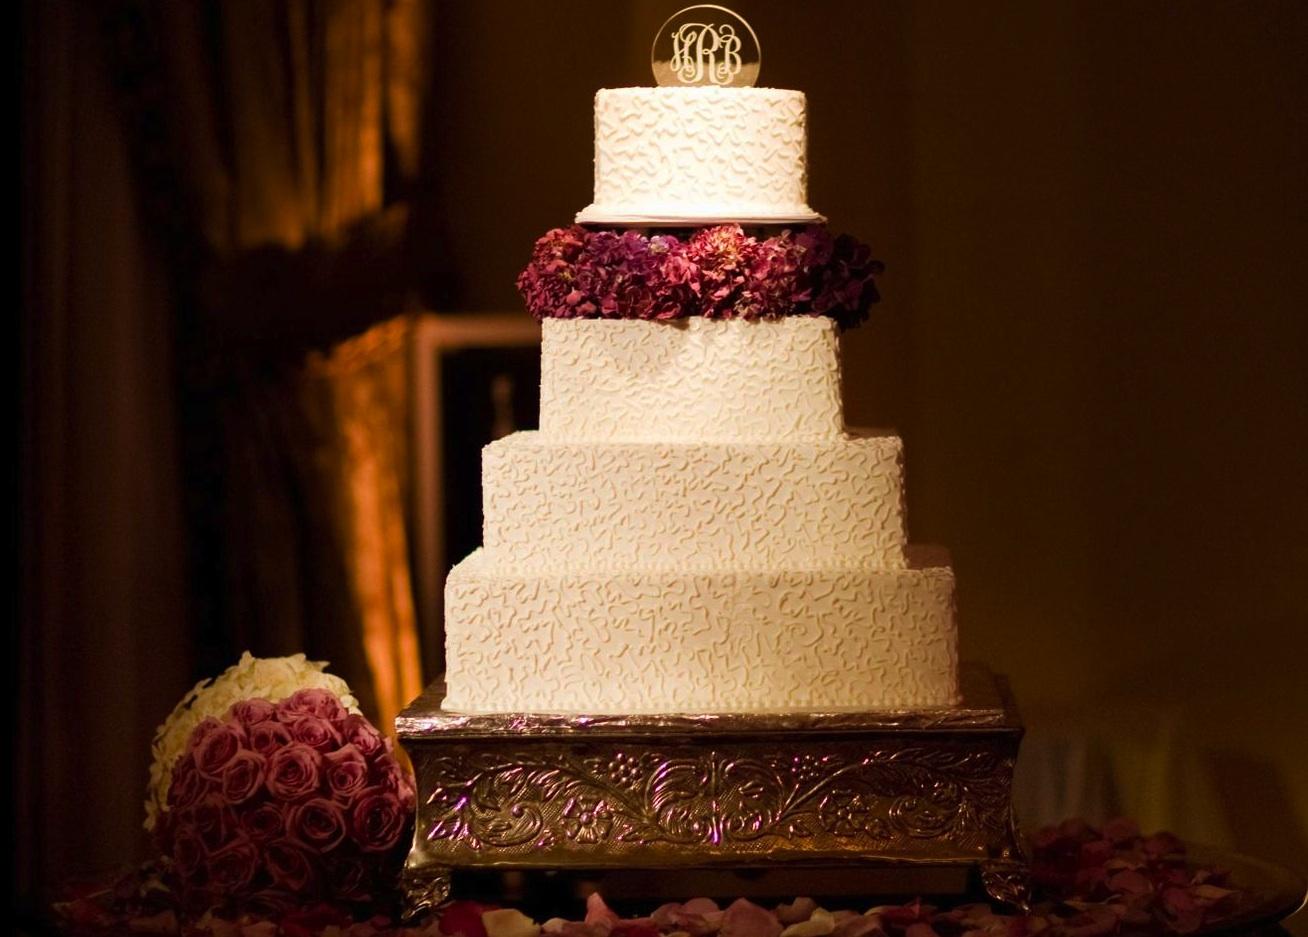 Square Wedding Cakes - Cake Ideas - Inside Weddings